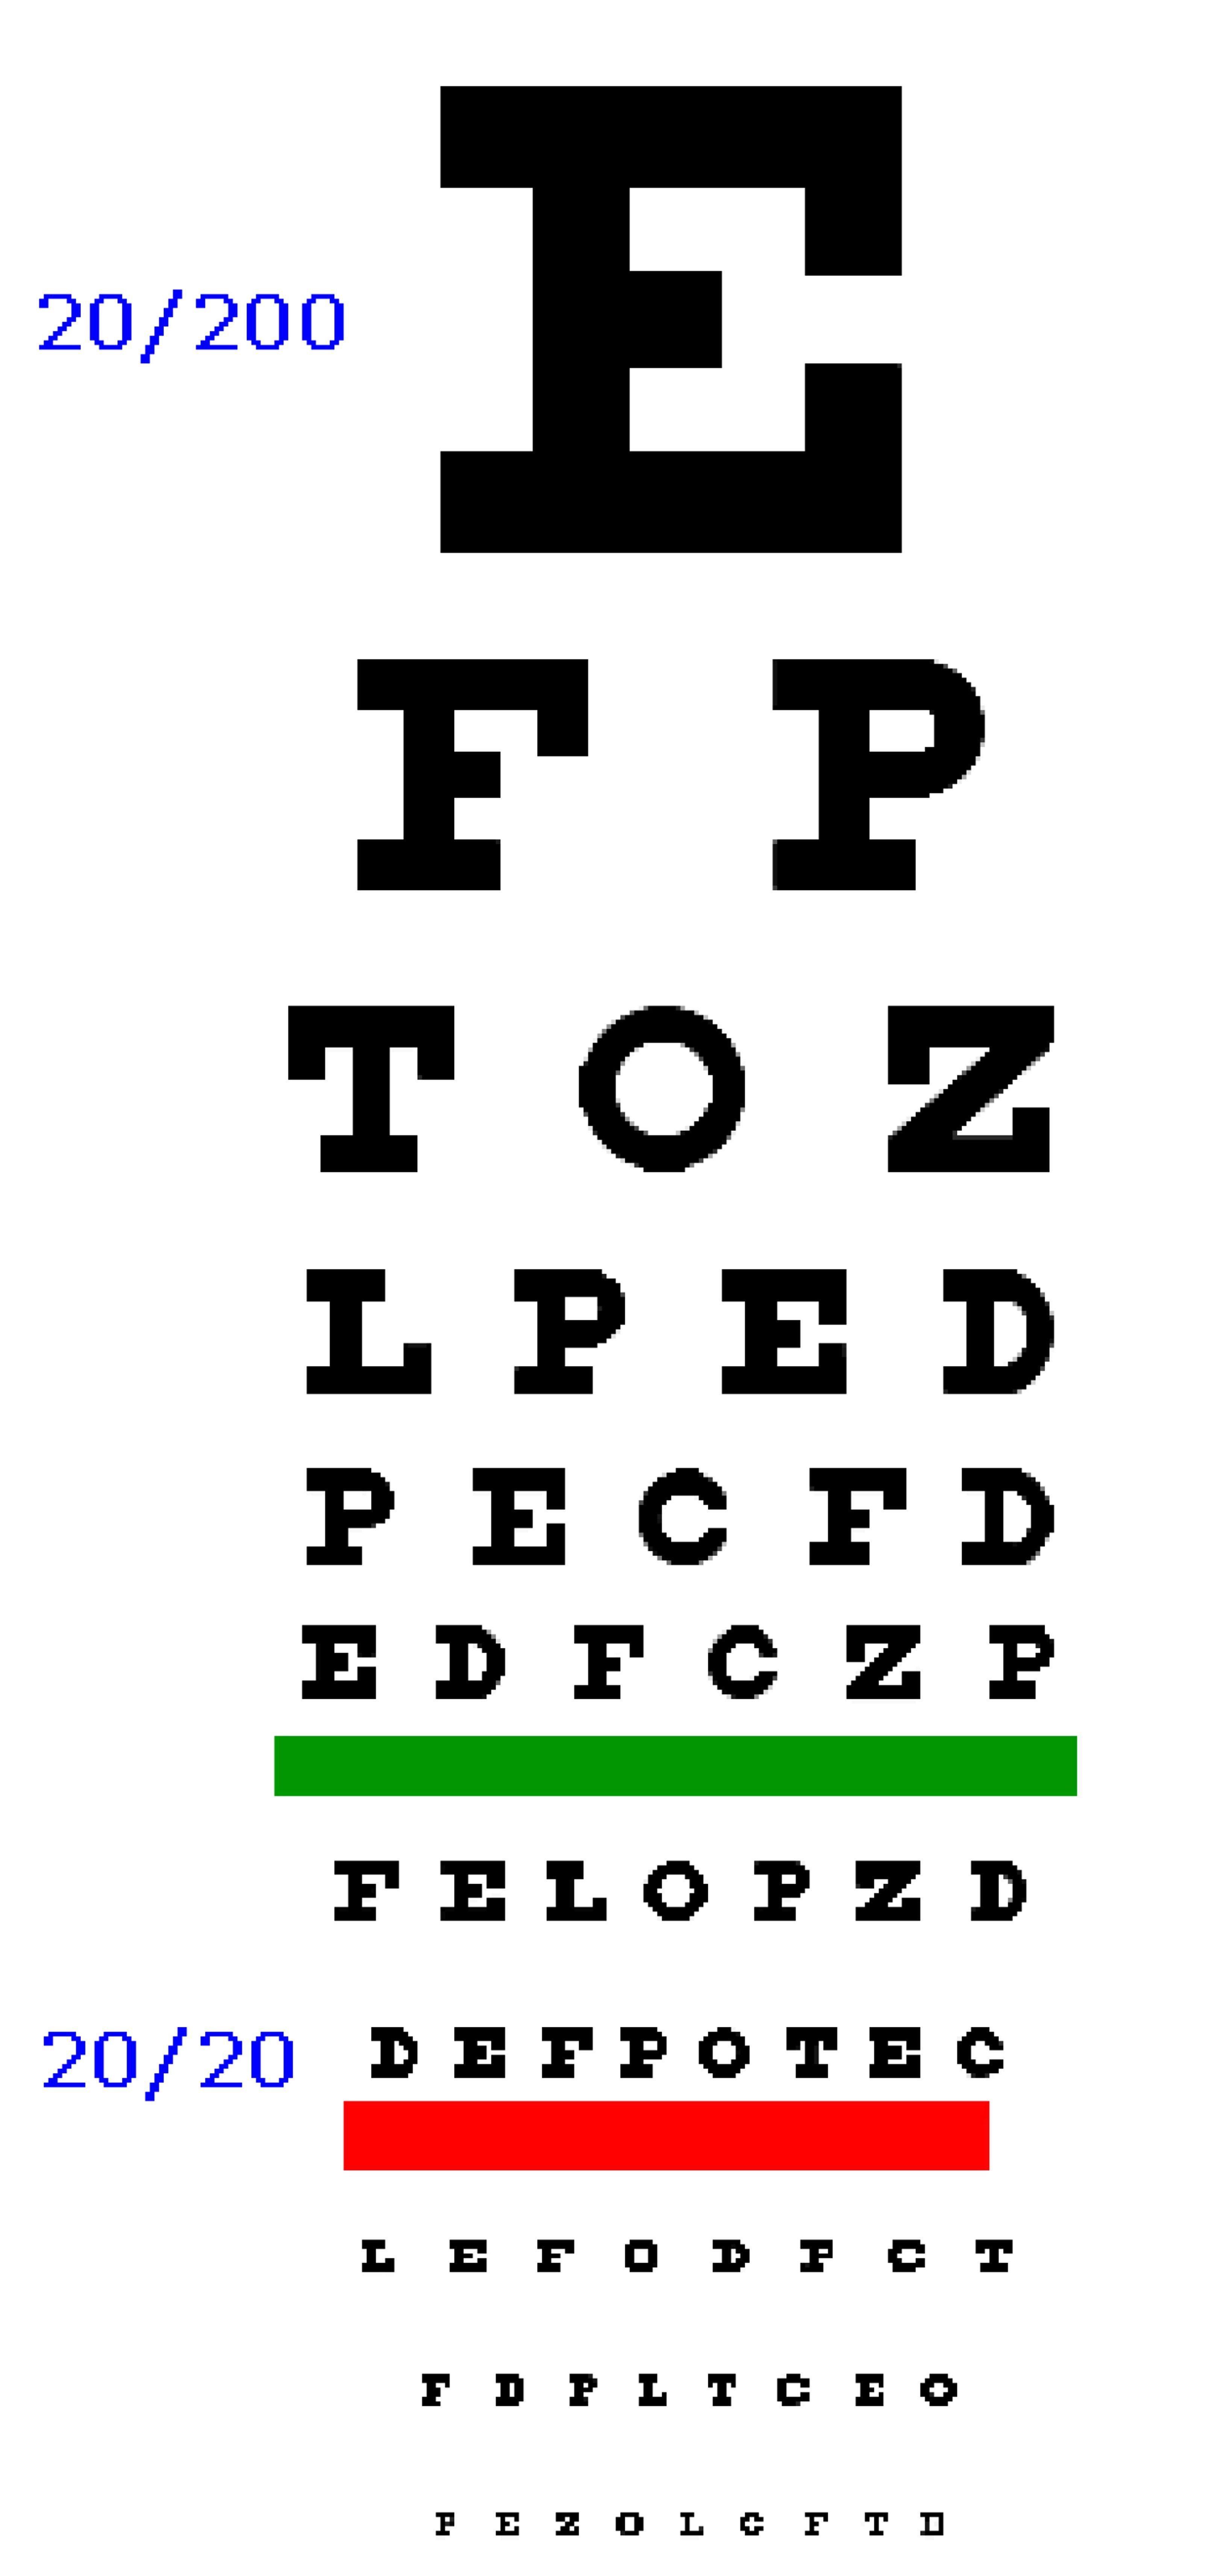 Memorable Hotv Eye Chart Printable Eye Exam Chart Pdf How To Read Snellen Eye Chart Hand Held Eye Chart Free Snell In 2020 Eye Chart Eye Chart Printable Eye Exam Chart